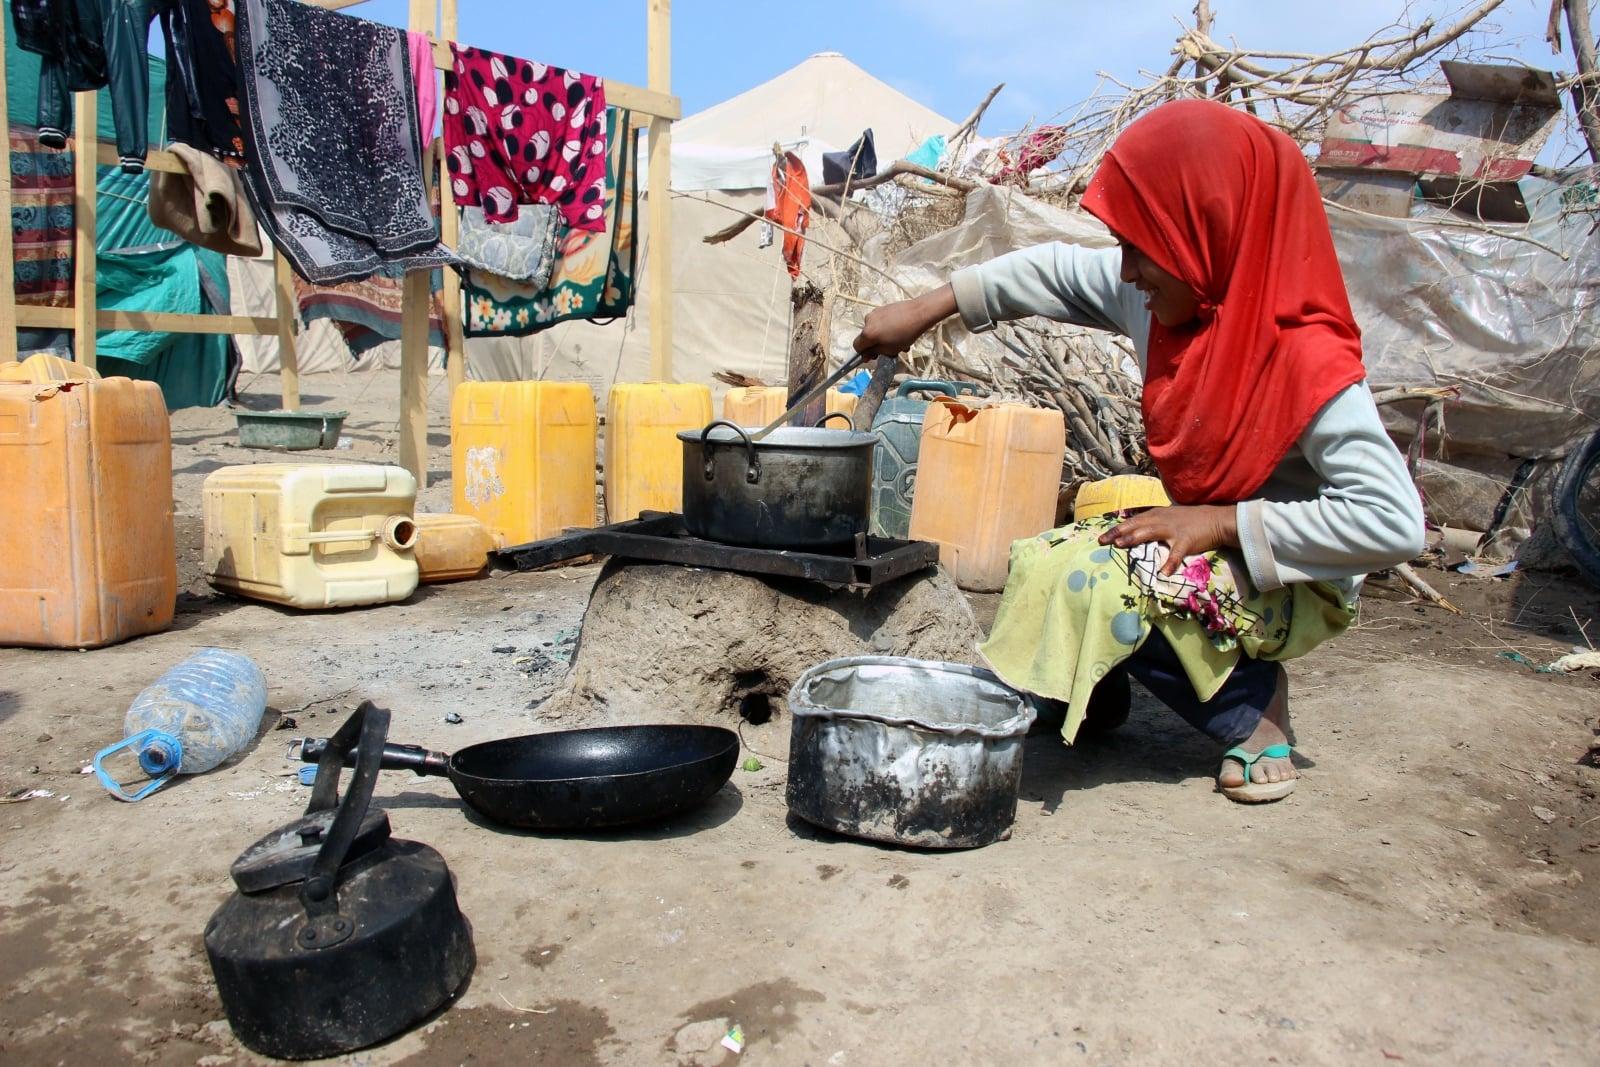 Trudna sytuacja humanitarna w Jemenie  EPA/STRINGER